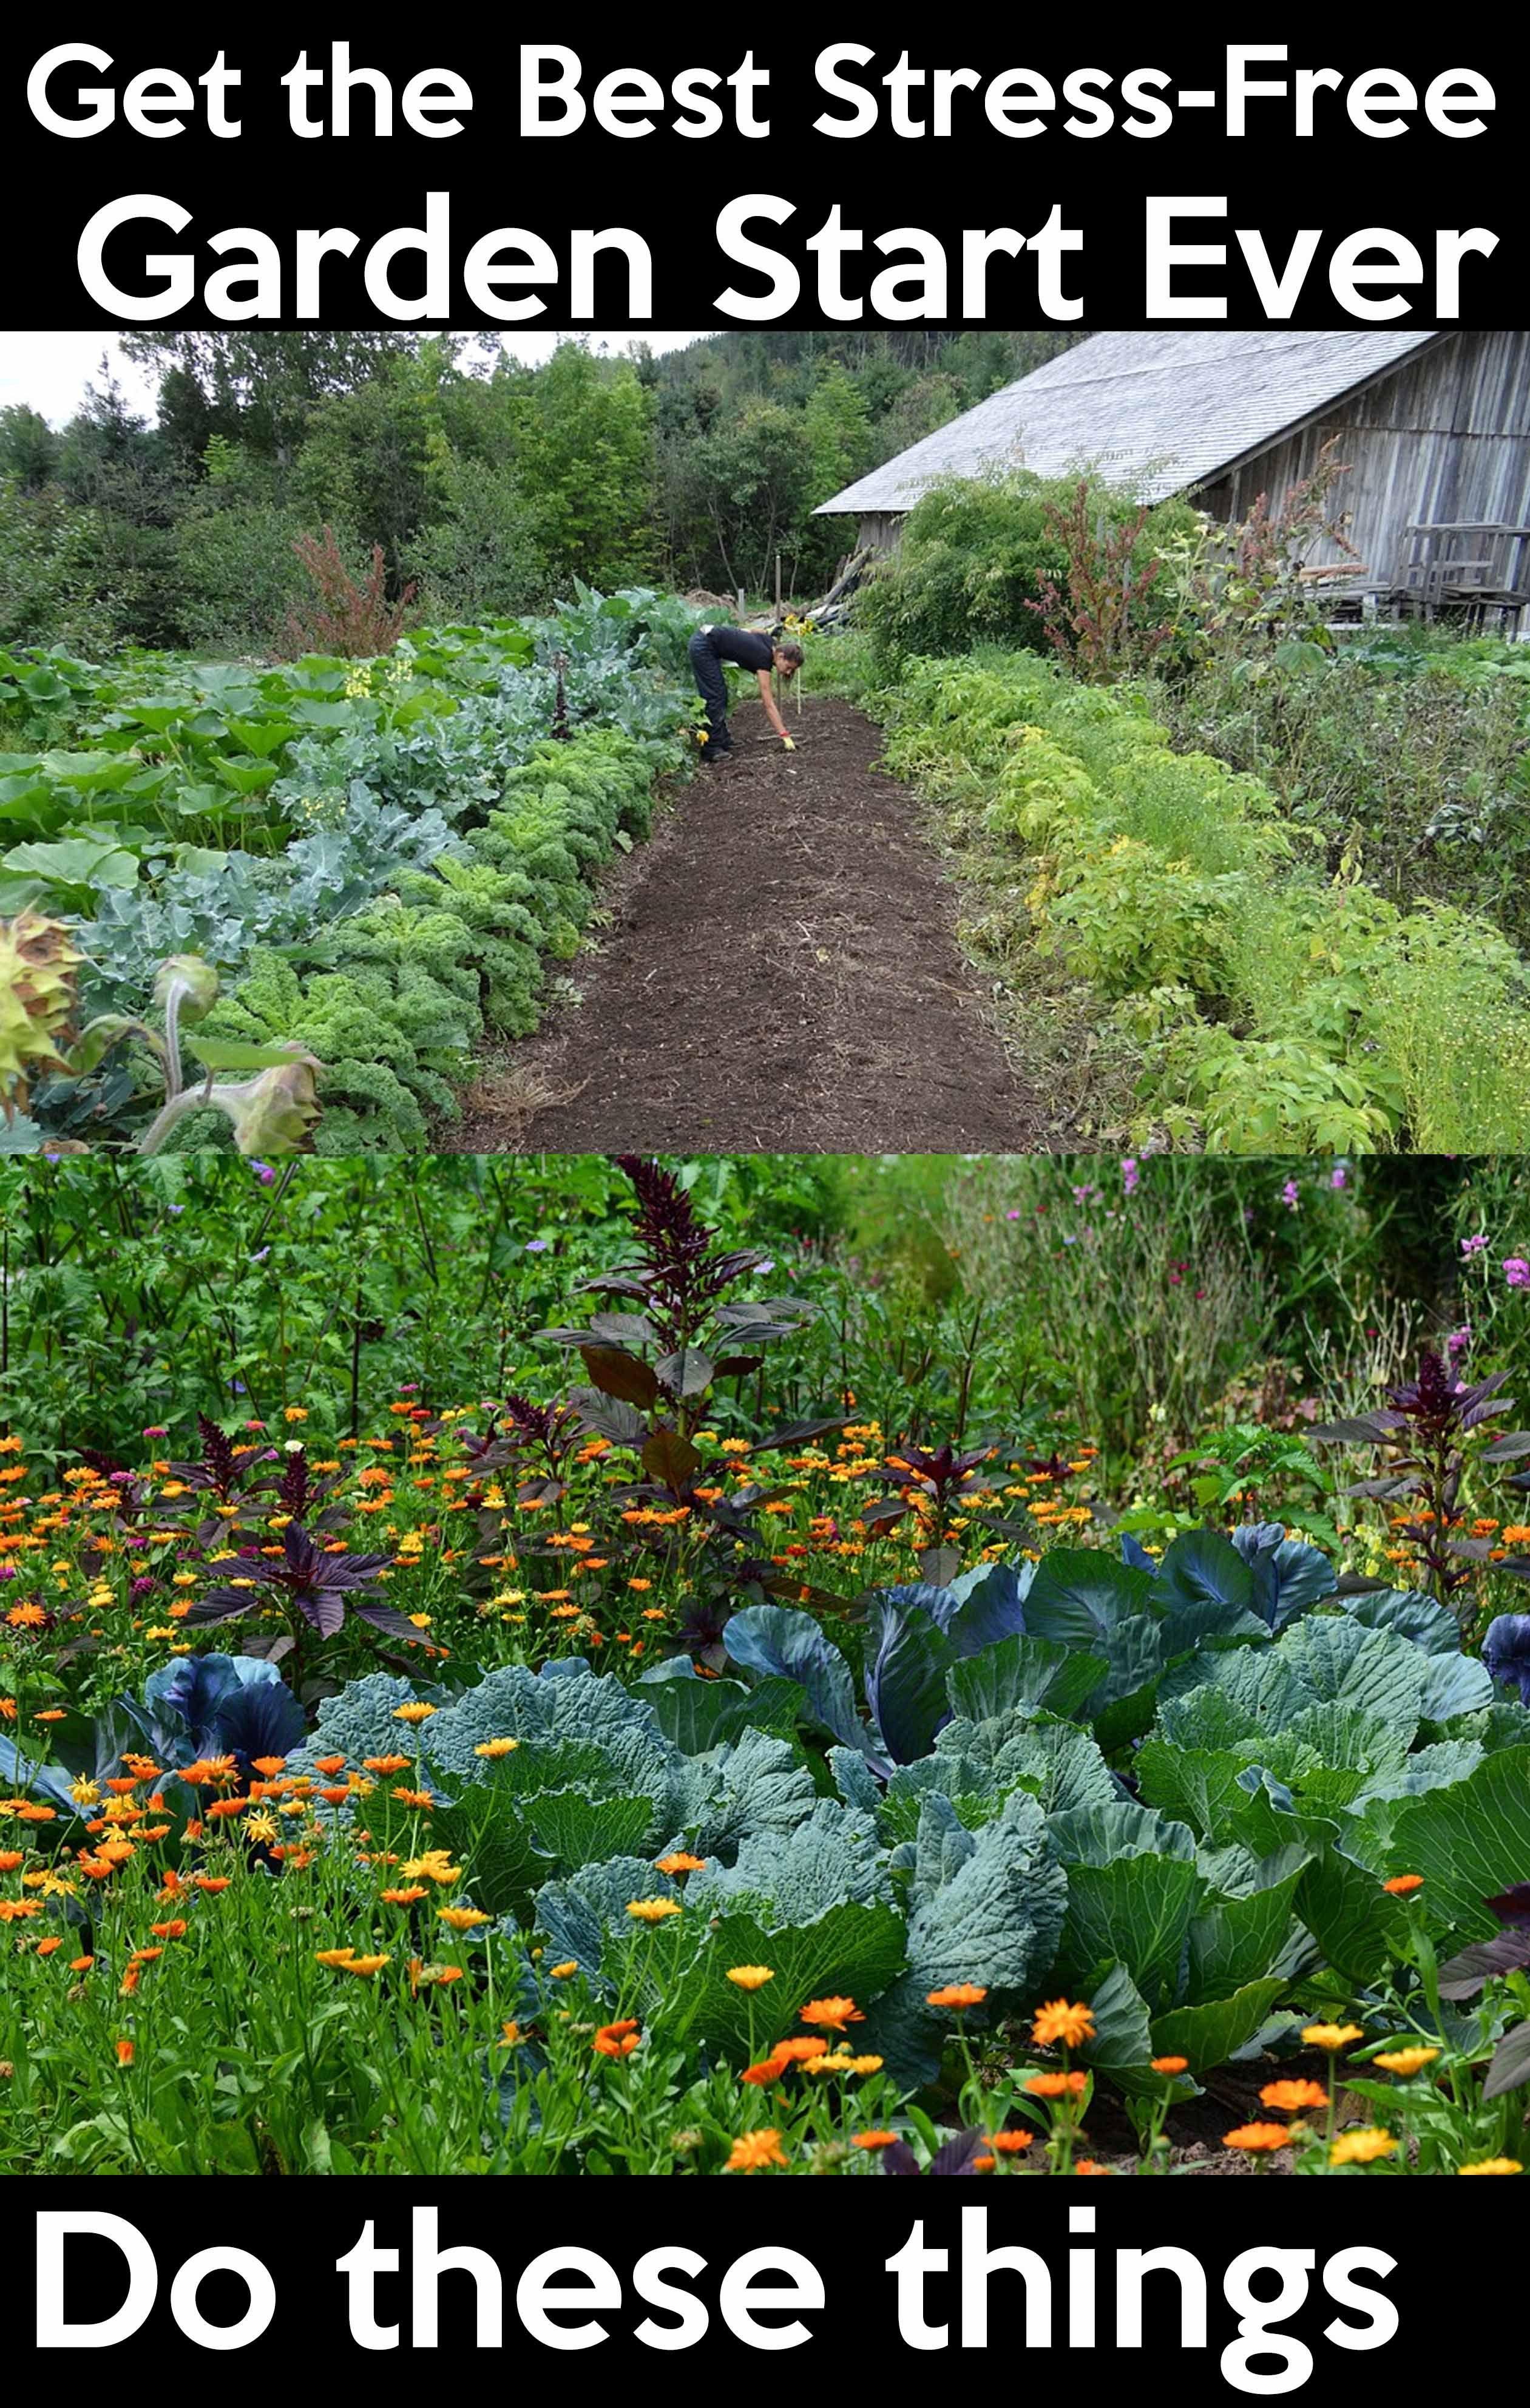 e10ecf99b63f407520dbfdf5e1c80383 - How Do Gardeners Make Money In Winter